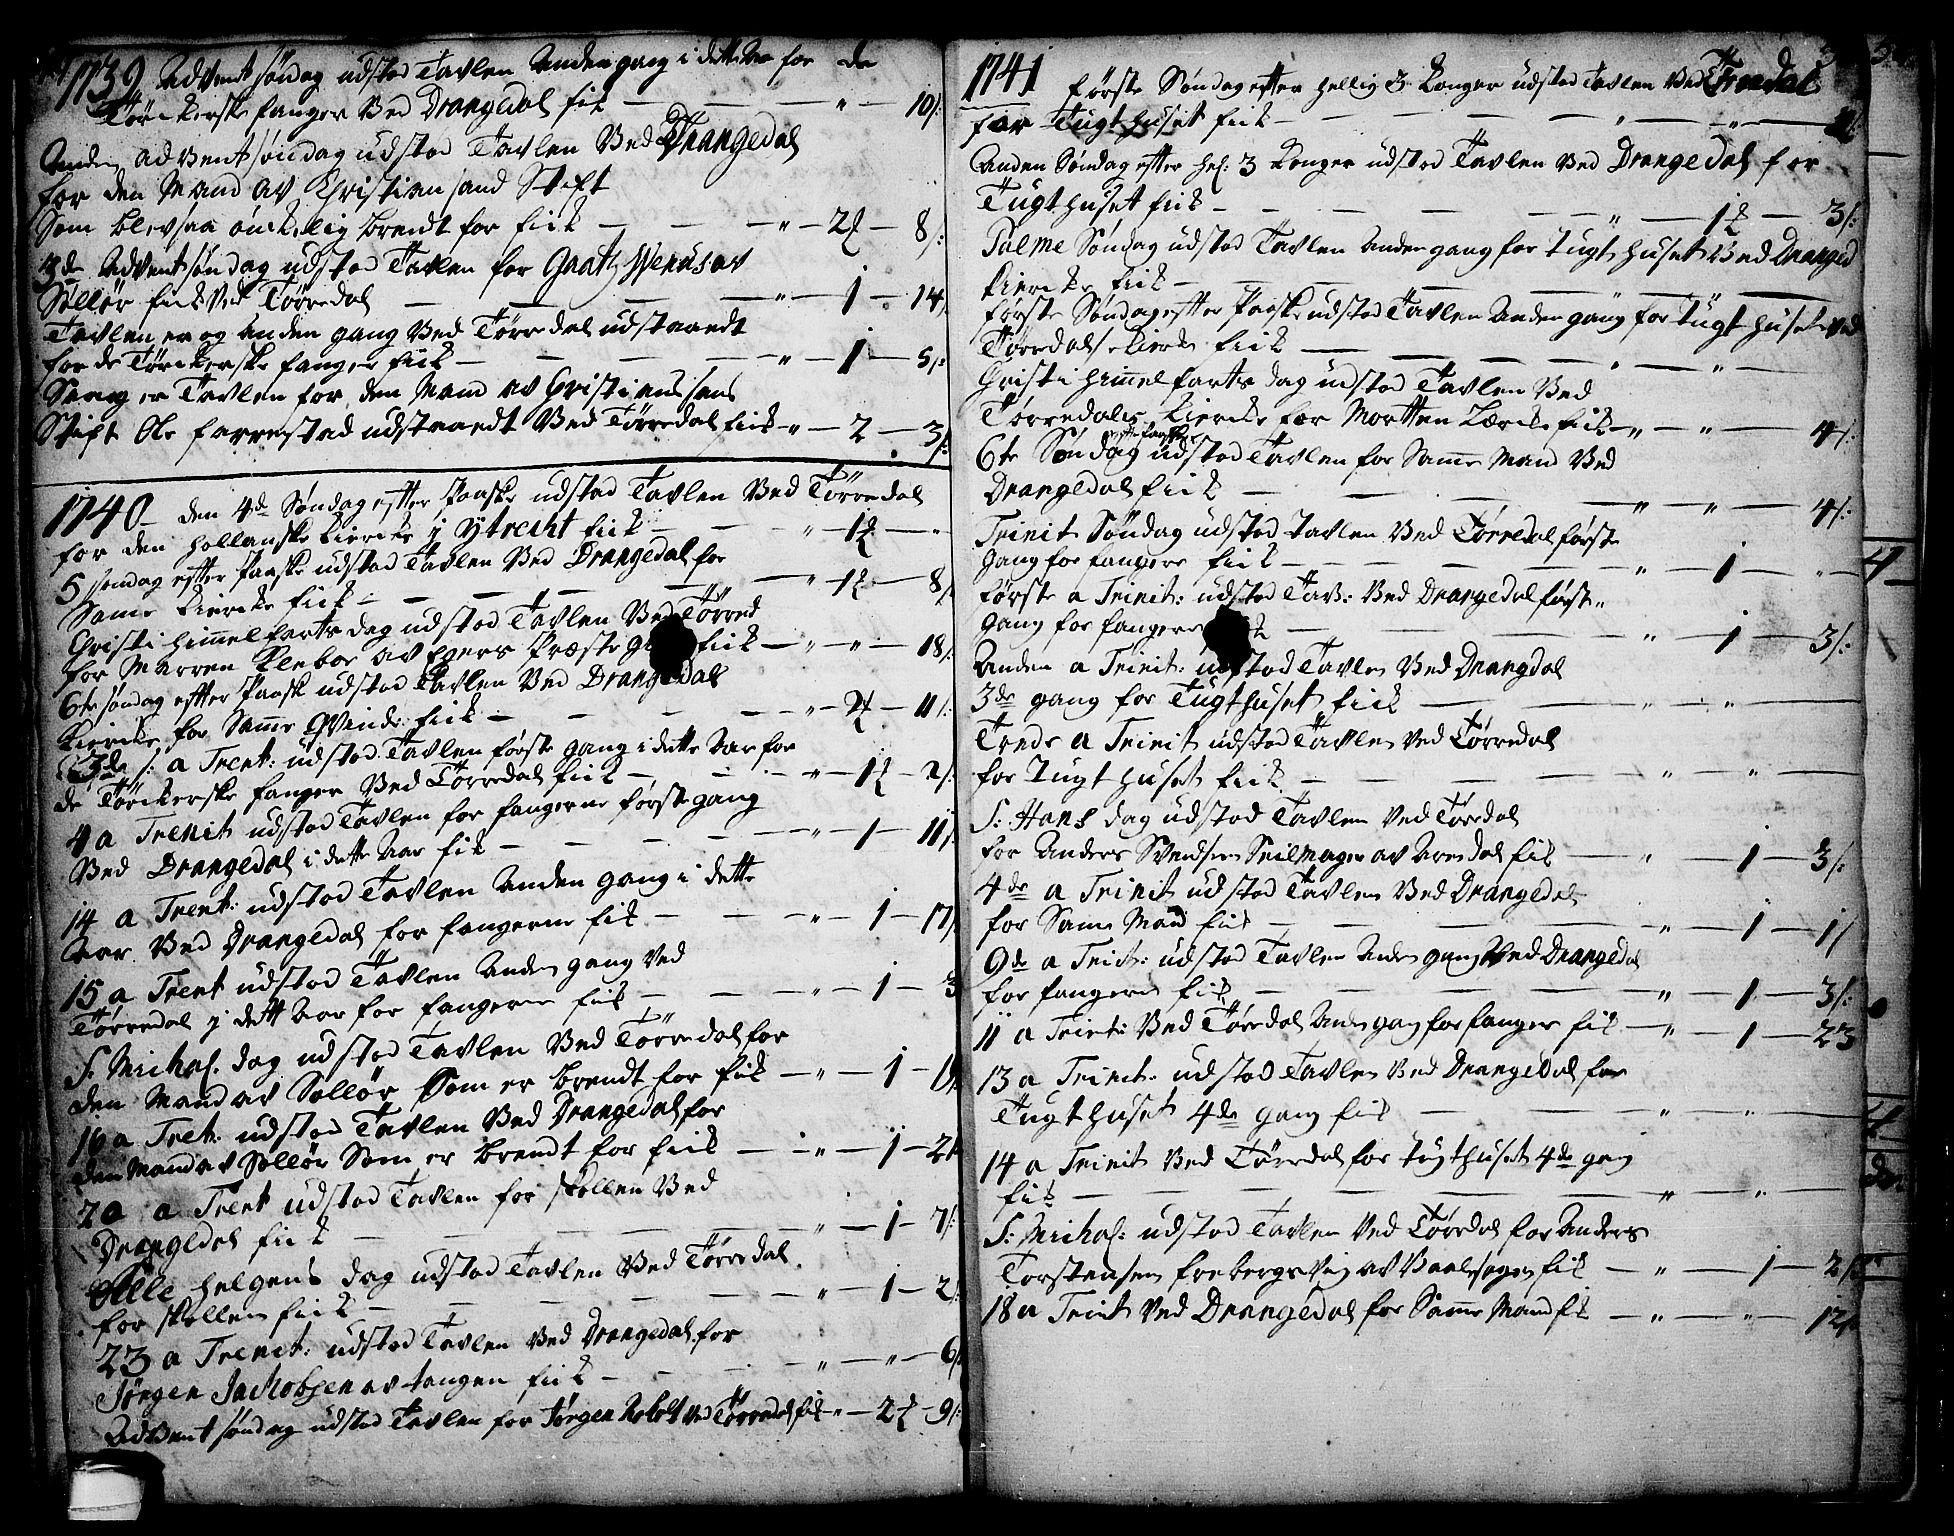 SAKO, Drangedal kirkebøker, F/Fa/L0002: Ministerialbok nr. 2, 1733-1753, s. 49-50